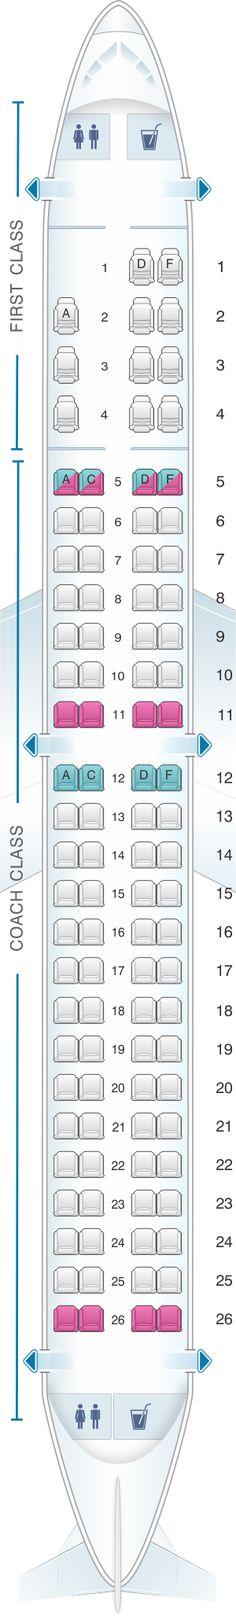 Seat Map US Airways Embraer 175